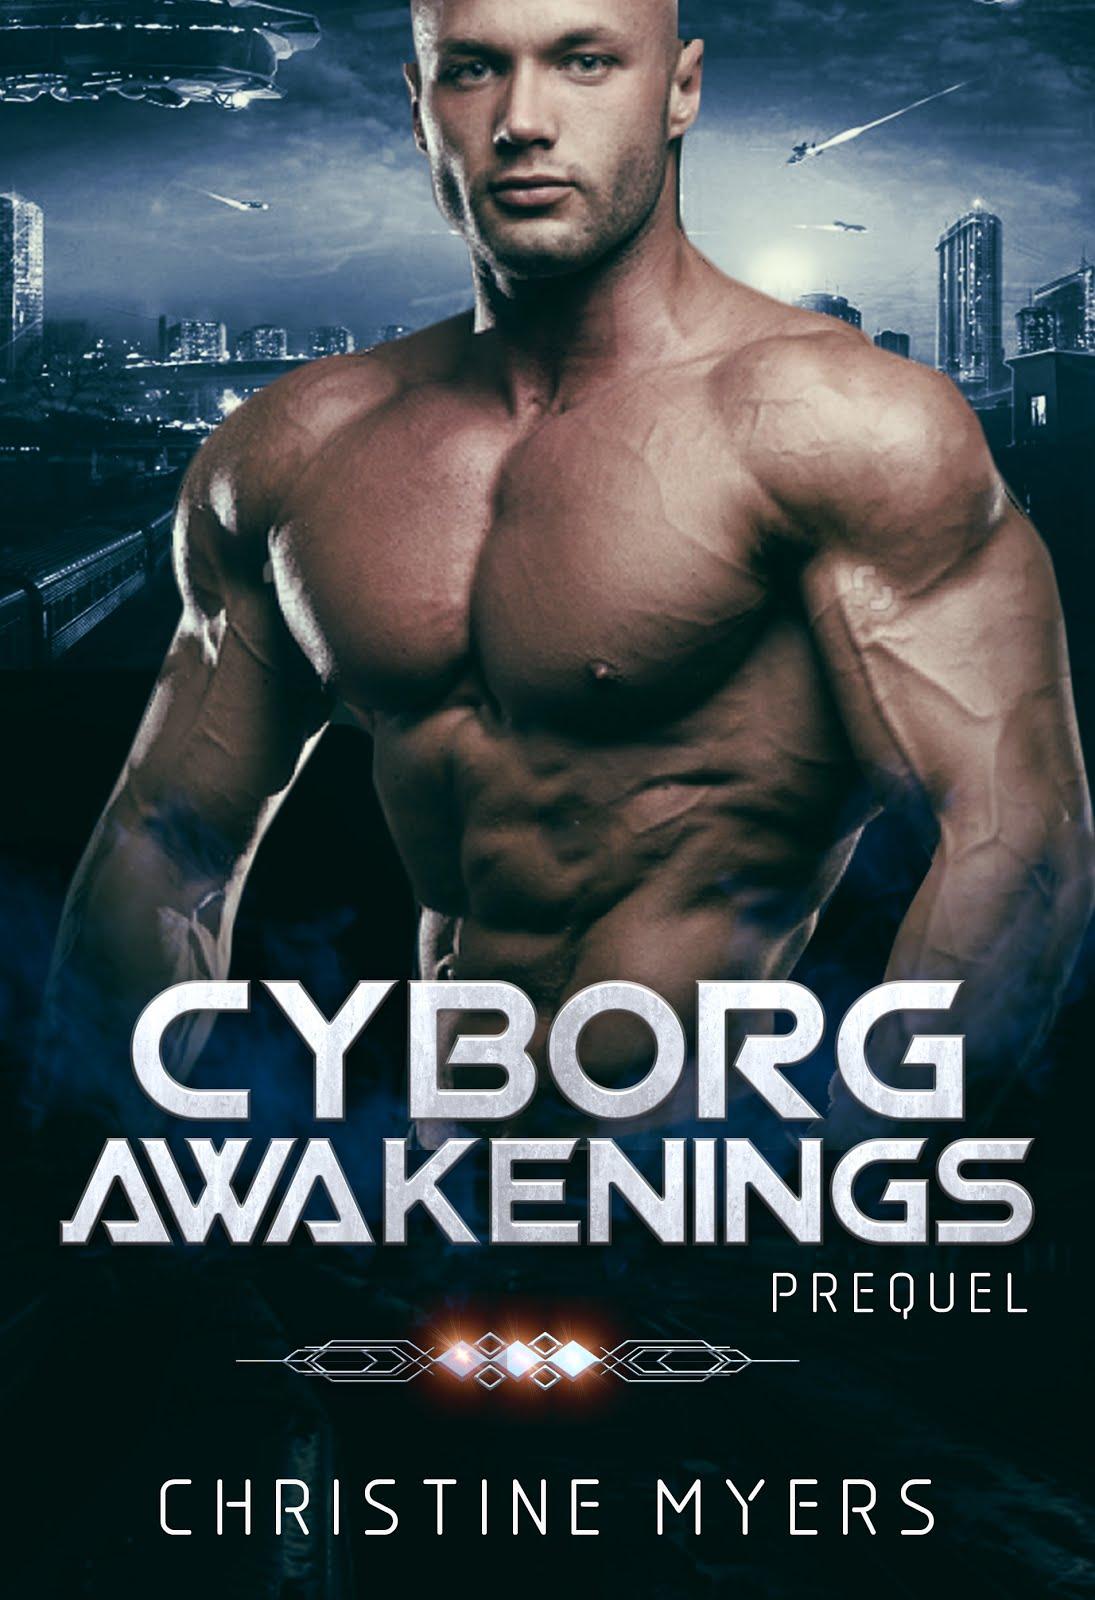 Cyborg Awakenings Prequel